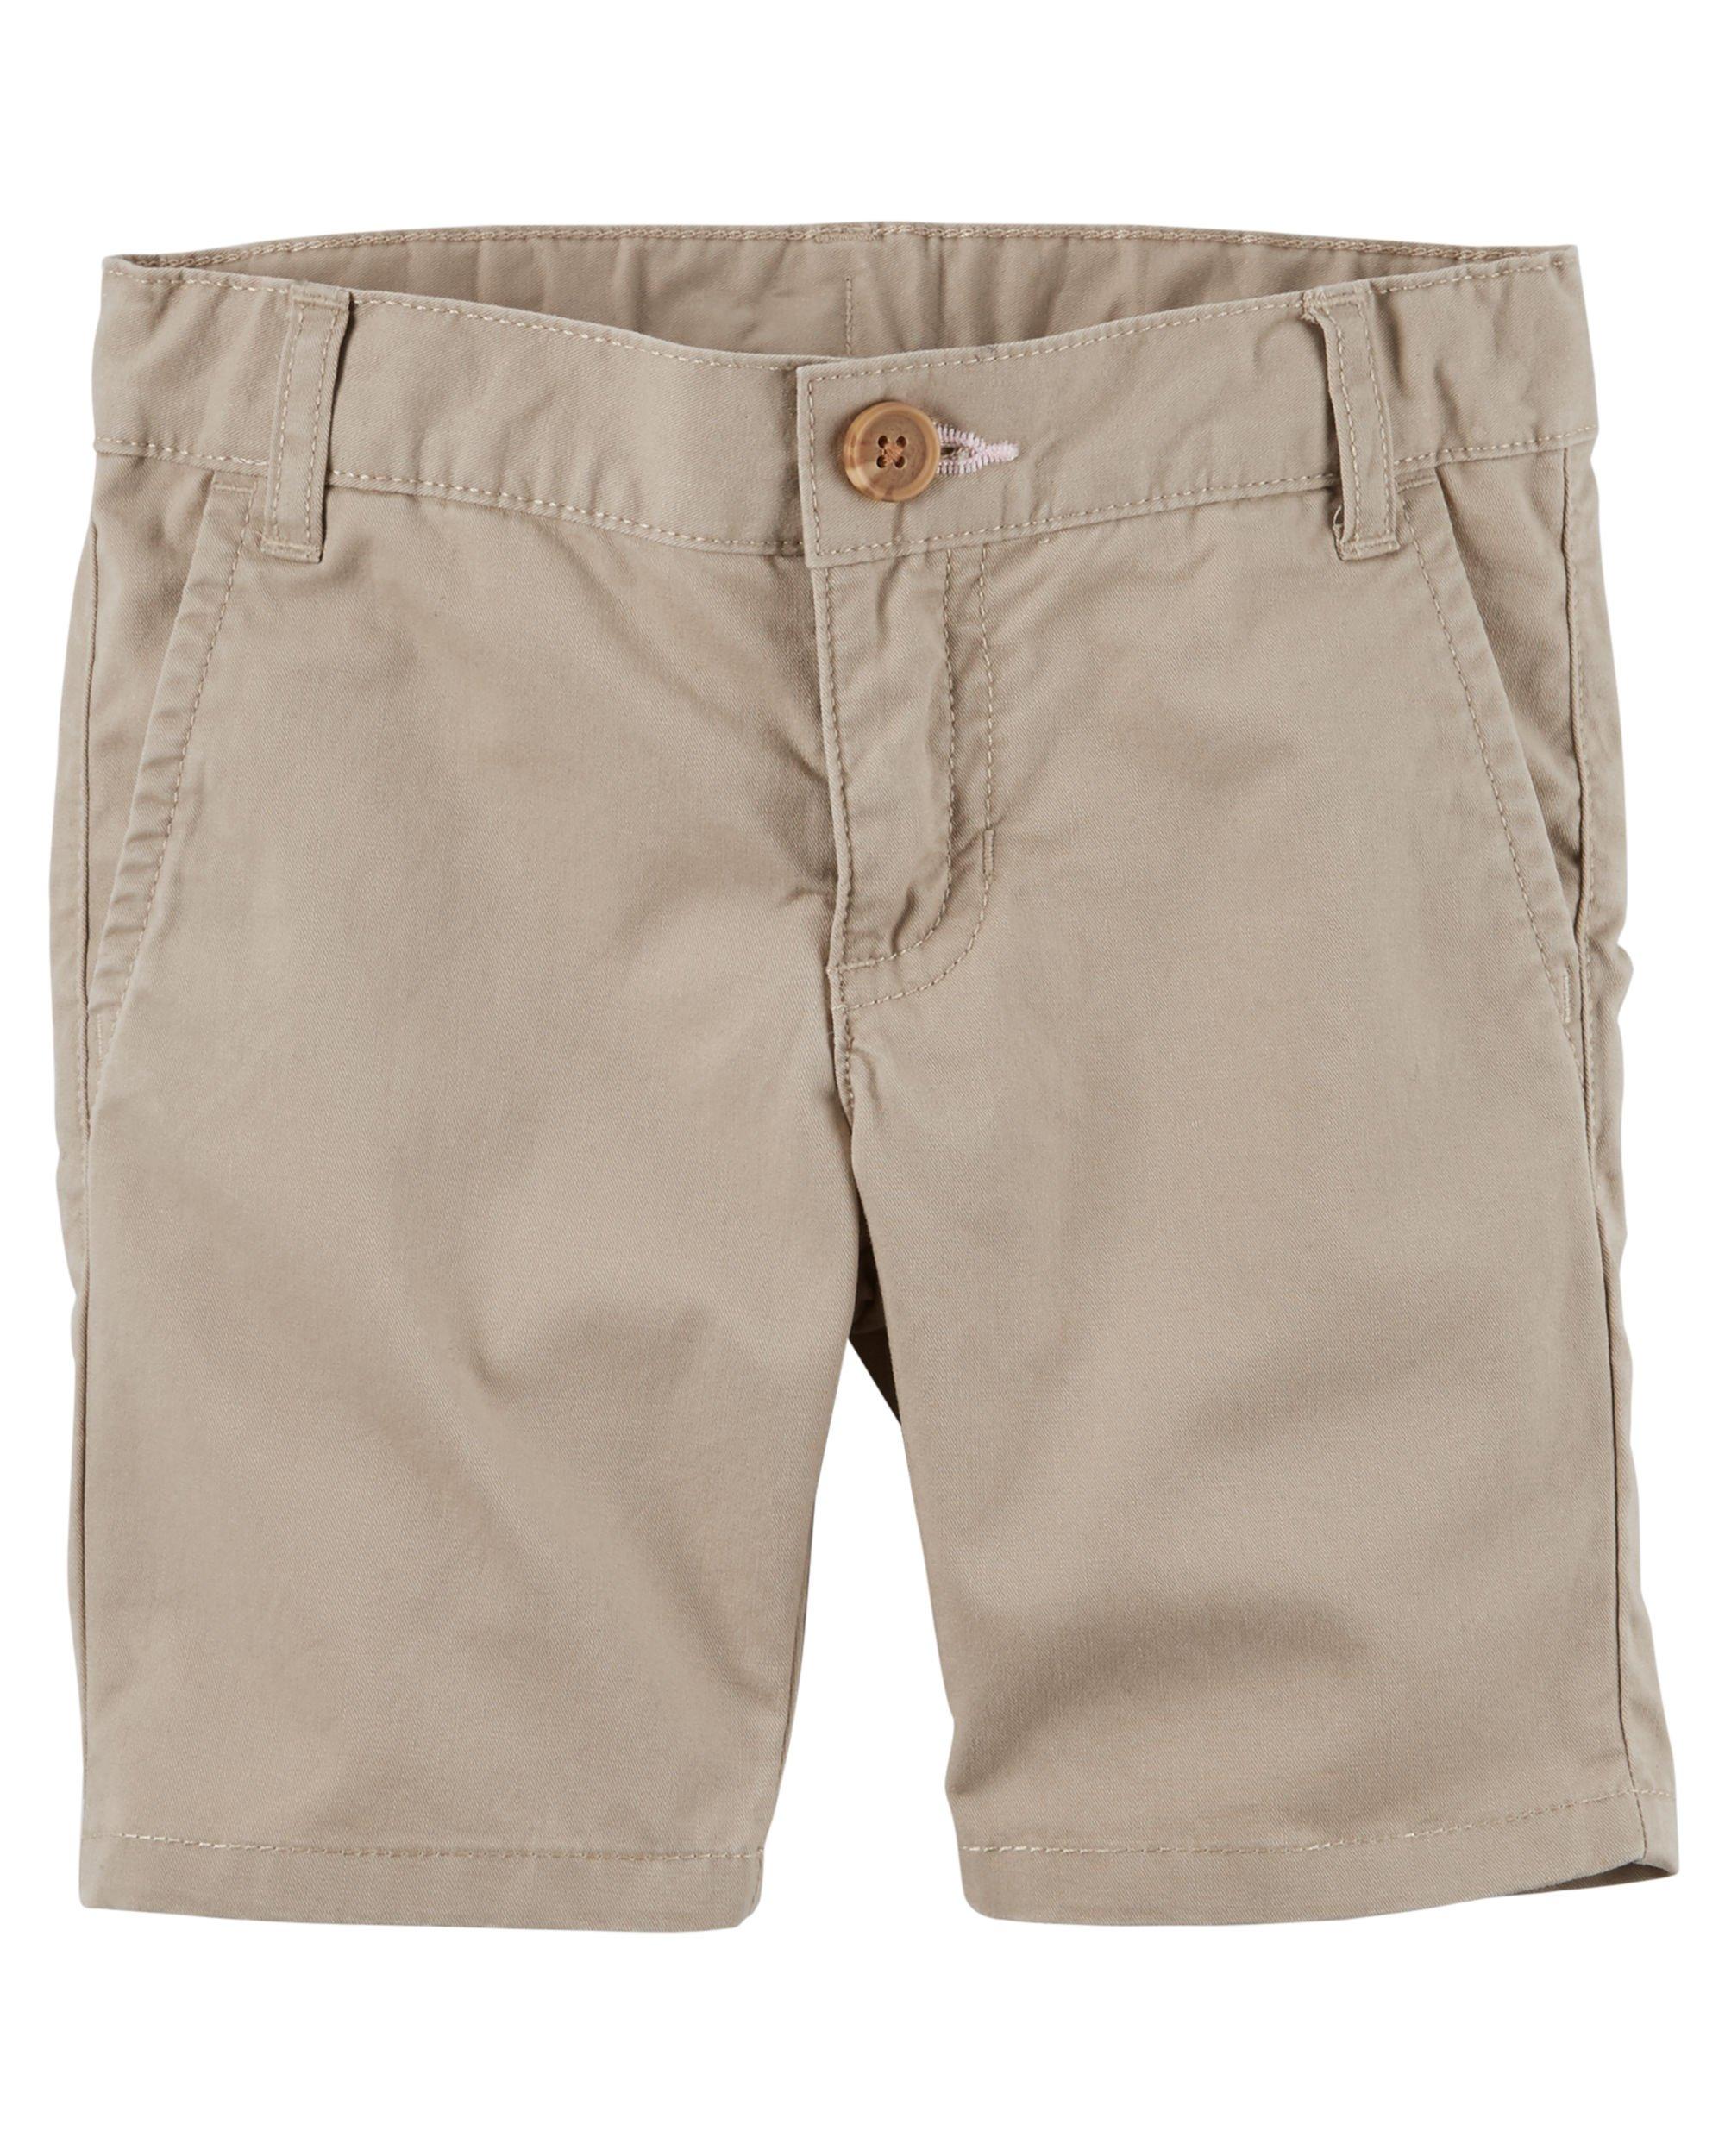 Carter's Girl's Khaki Button Front Cotton Shorts (2T)